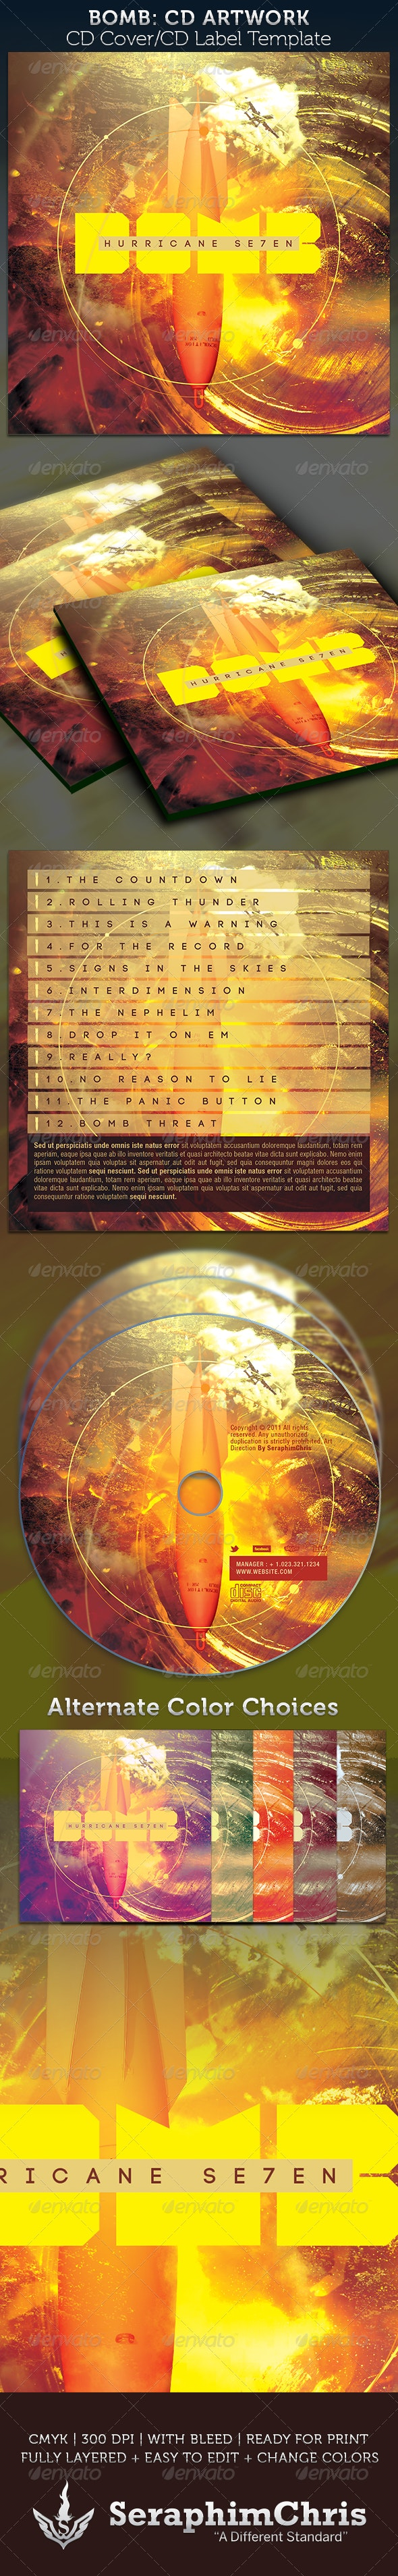 Bomb CD Cover Artwork Template - CD & DVD Artwork Print Templates